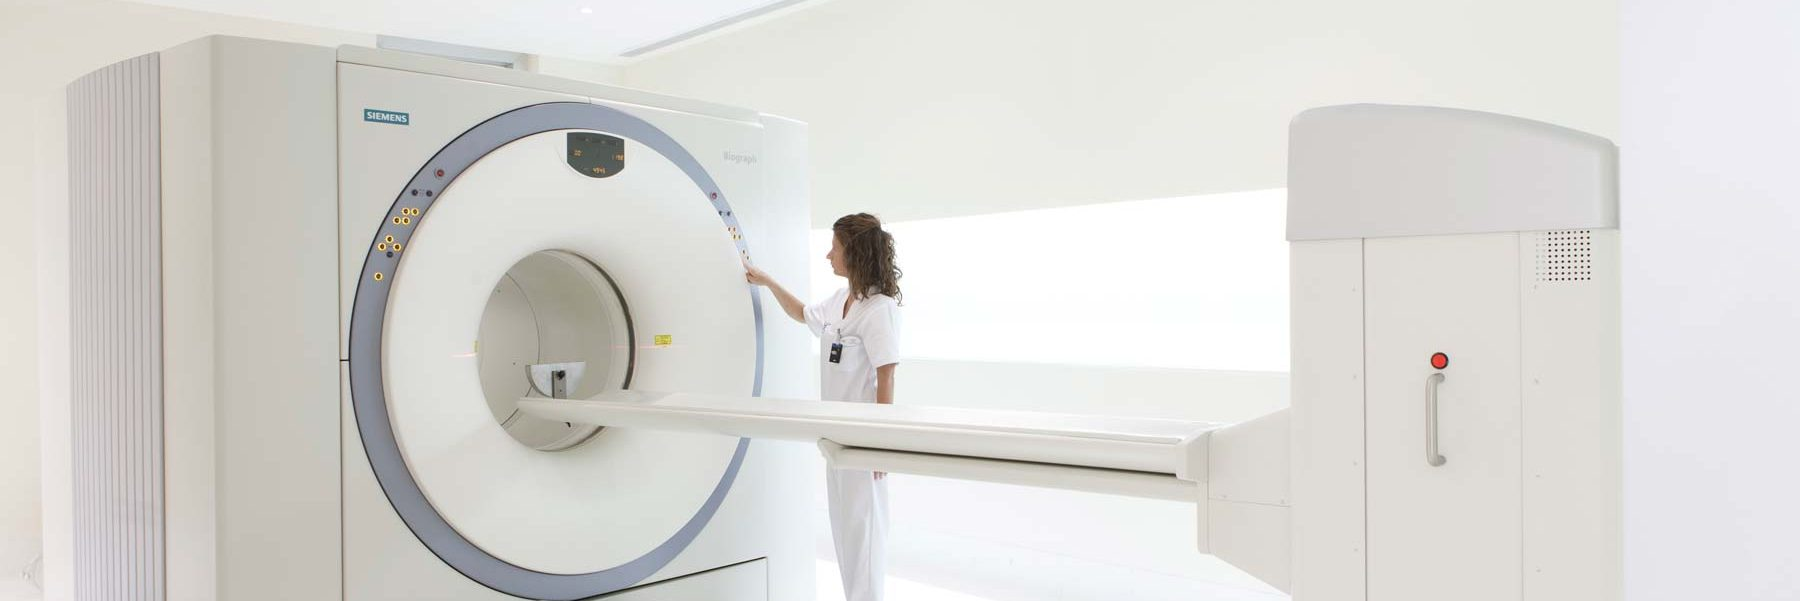 TAC PET Oncología